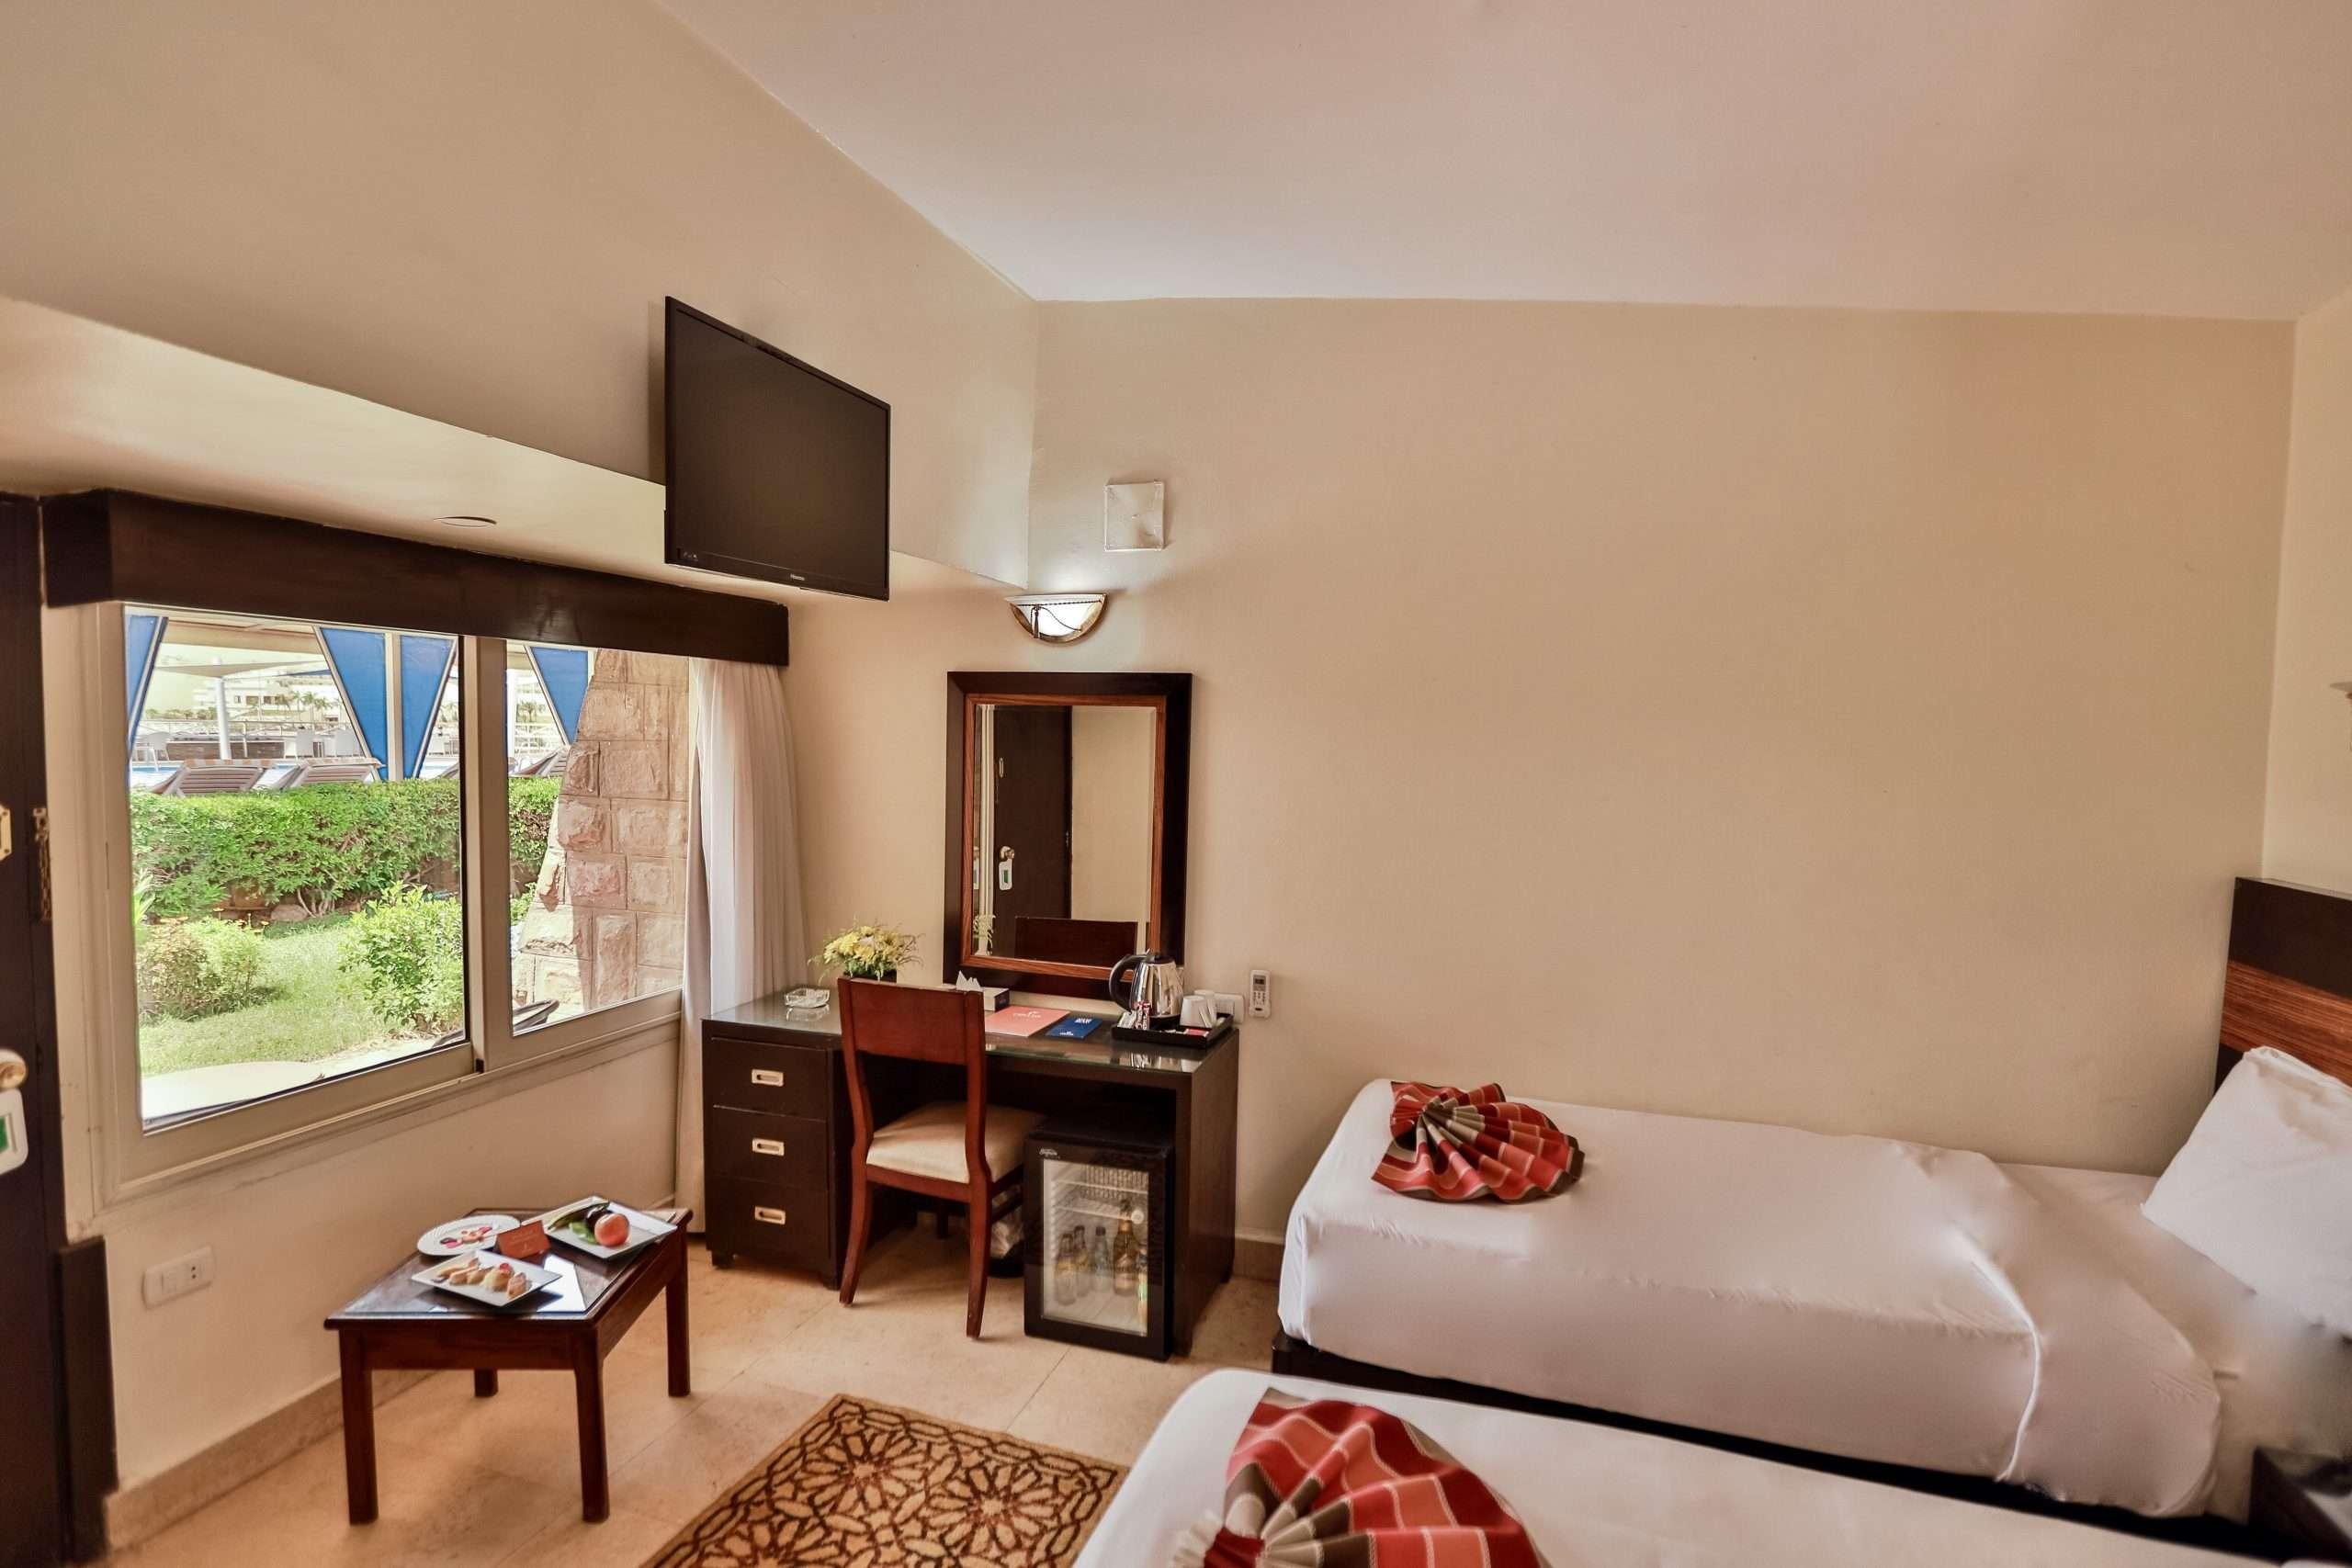 Pool View Room at Obelisk Nile Hotel in Aswan